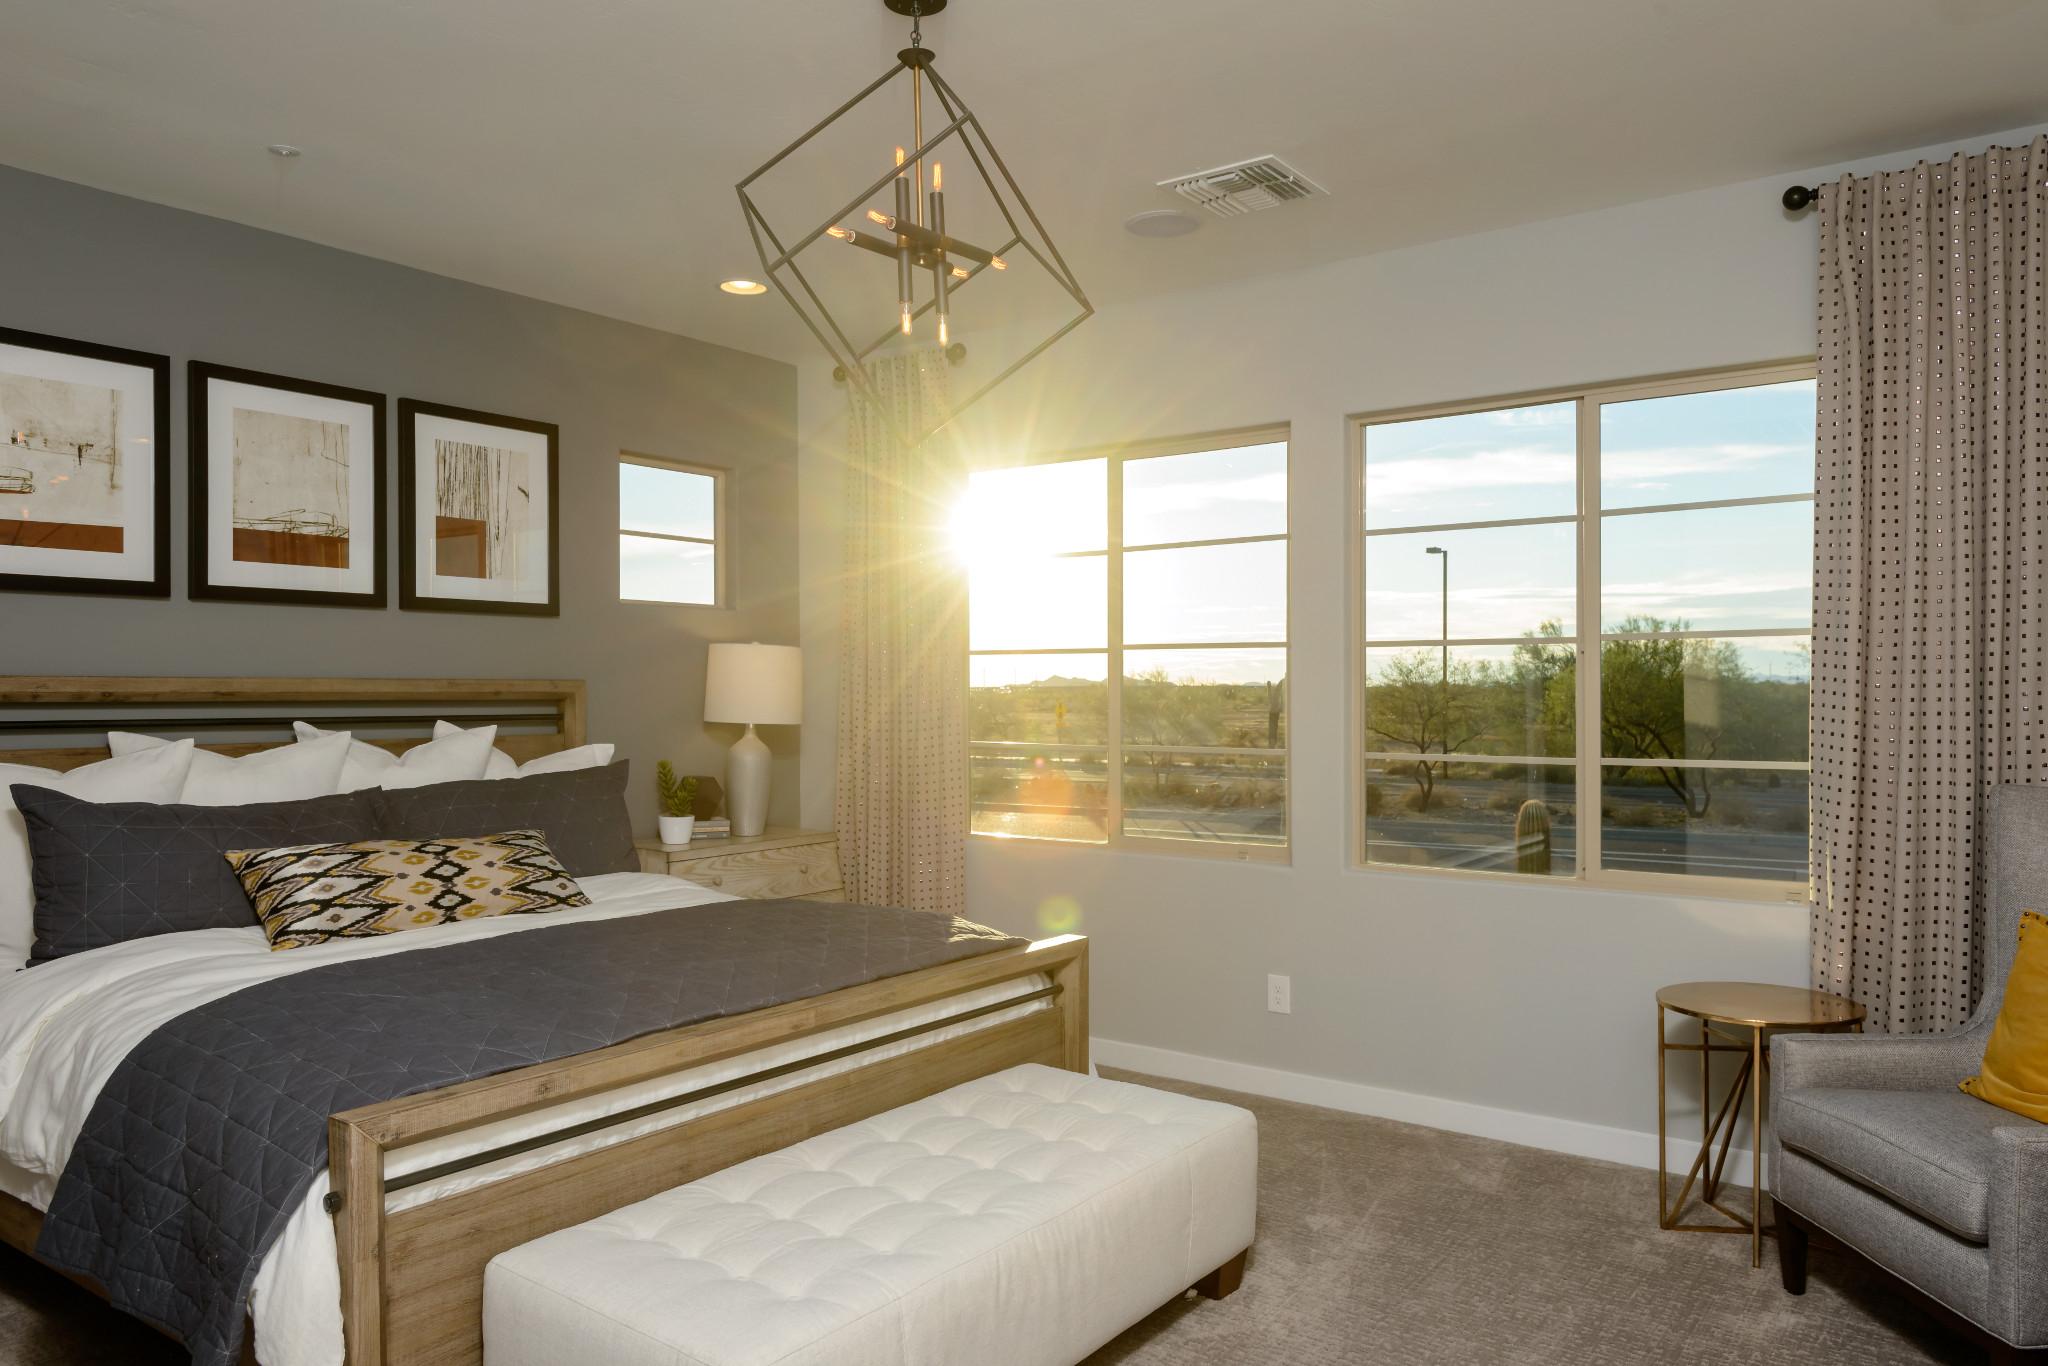 24 North 1003 Polaris Plan Master Bedroom